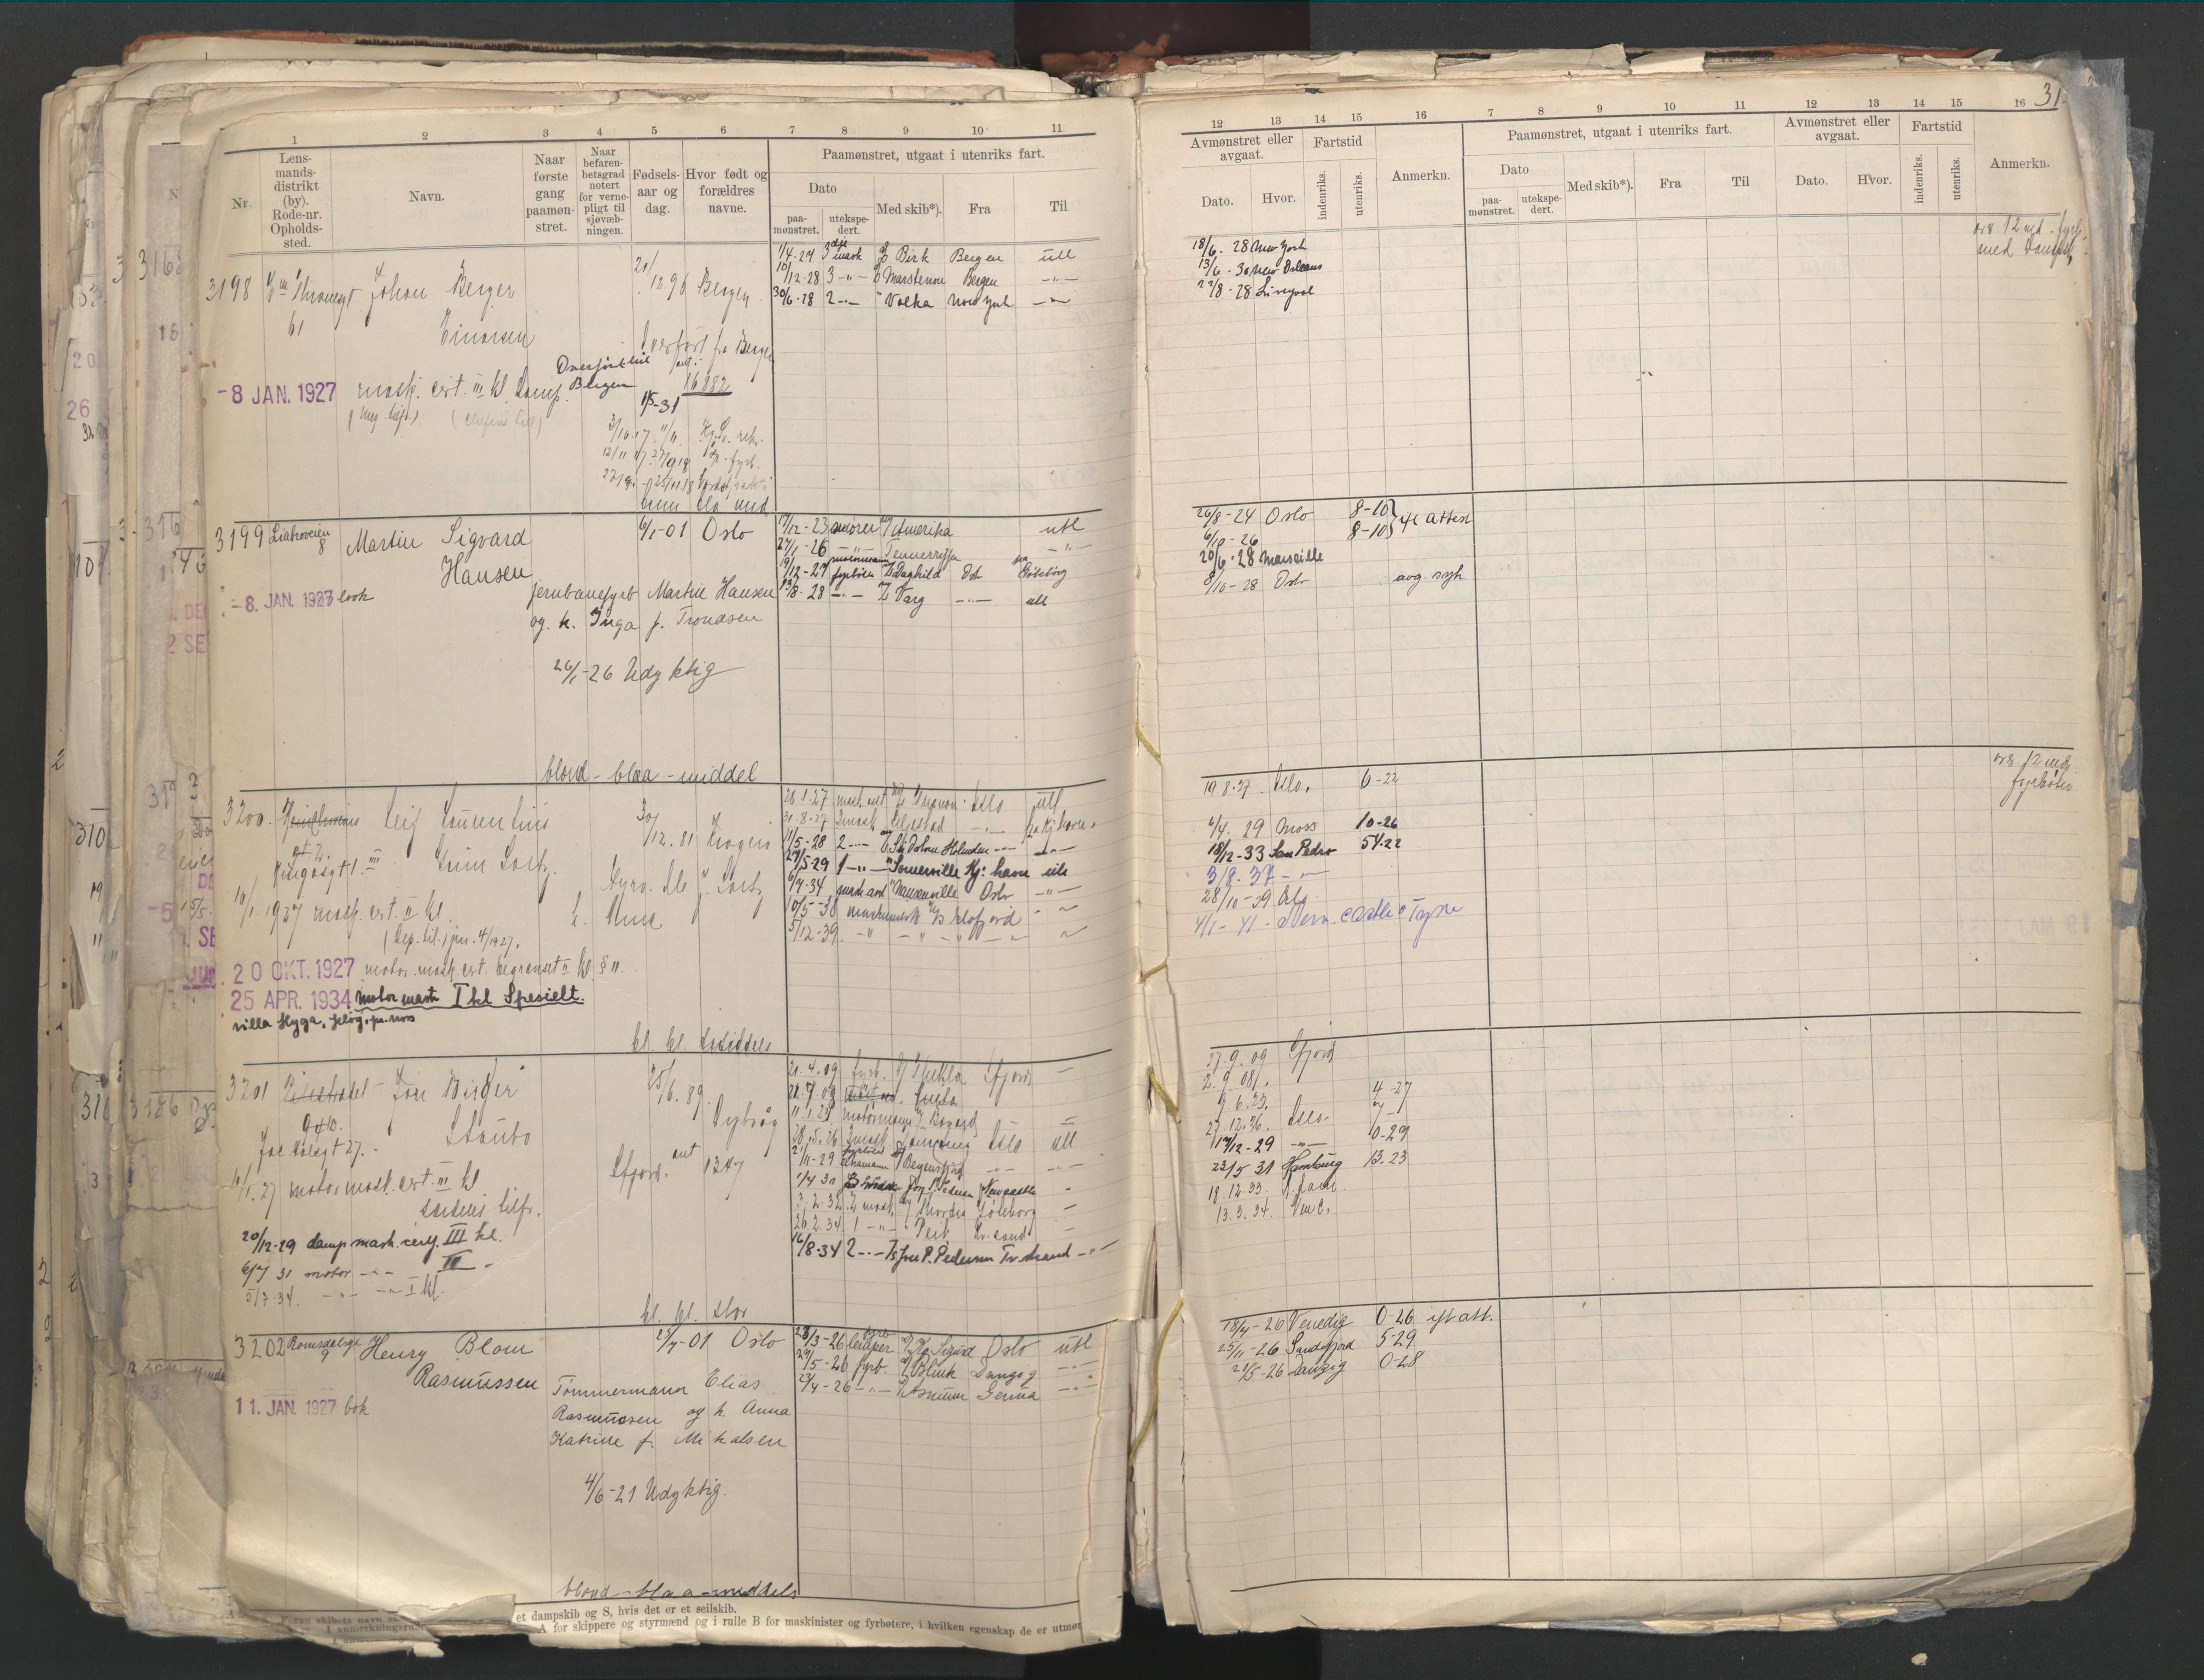 SAO, Oslo sjømannskontor, F/Fd/L0003: B-rulle, 1916, s. 311b-312a